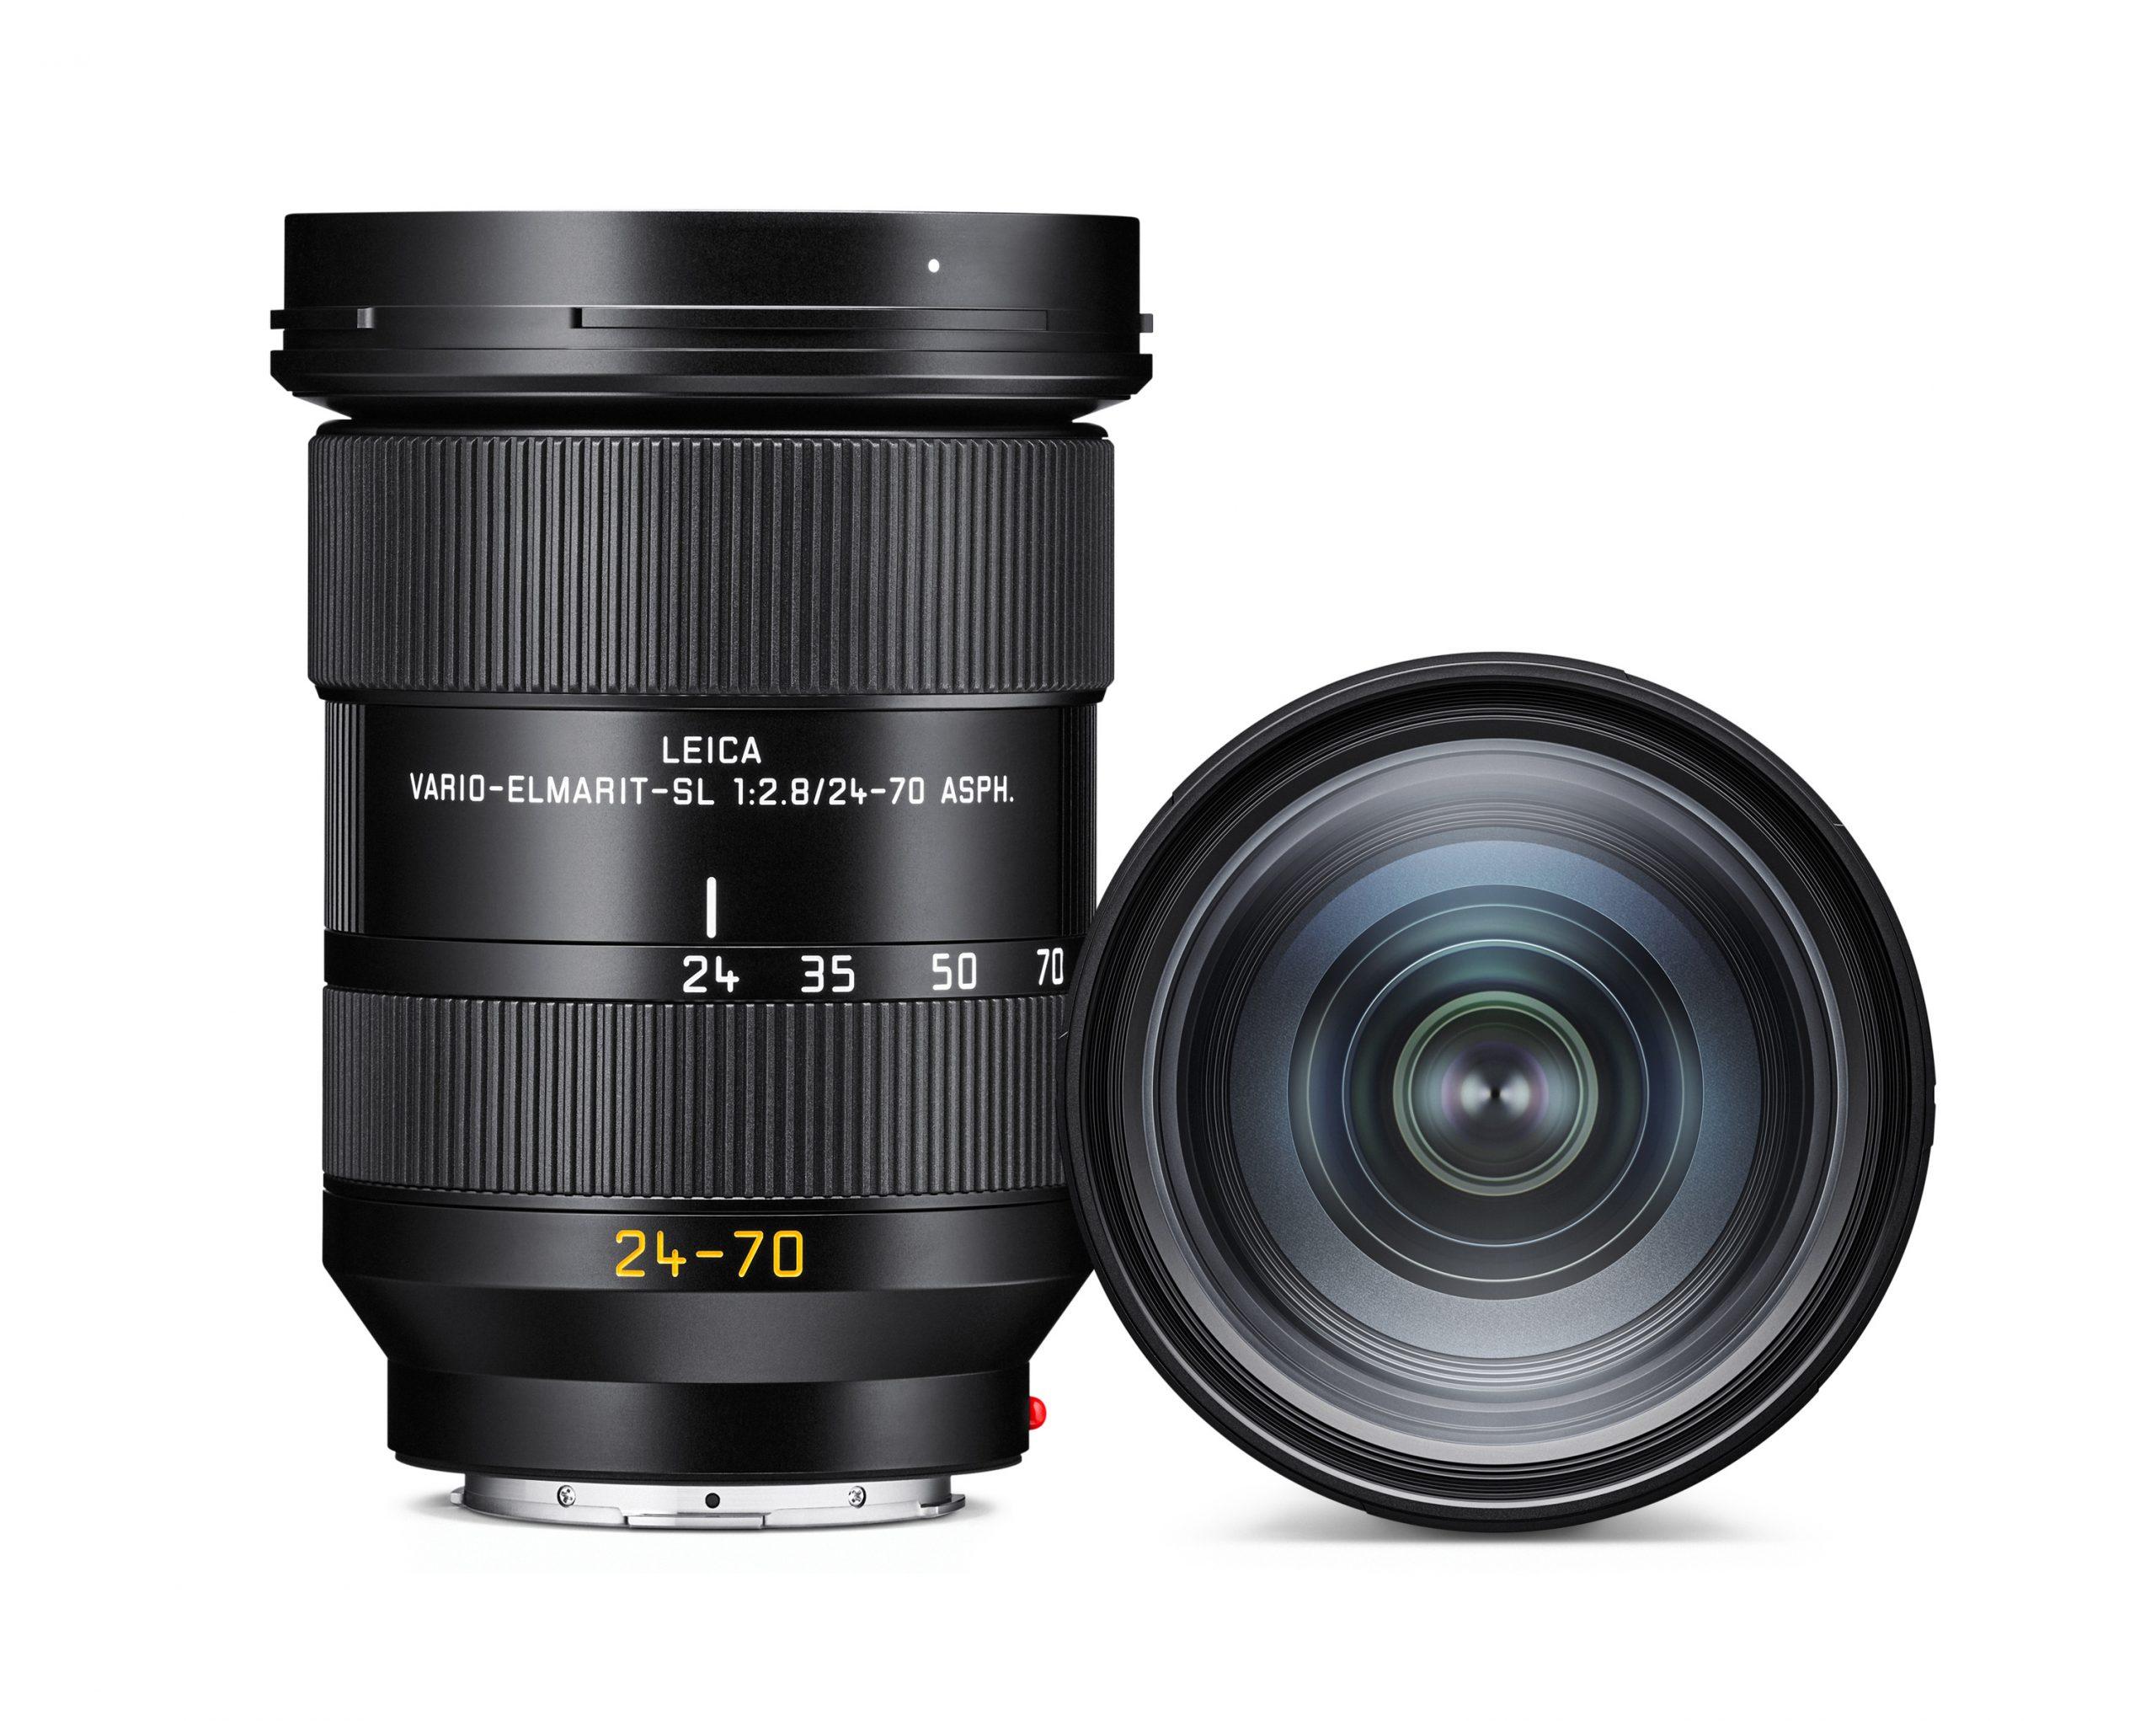 Das Leica Vario-Elmarit-SL 1:2.8/24–70 ASPH.(c) Leica Camera AG